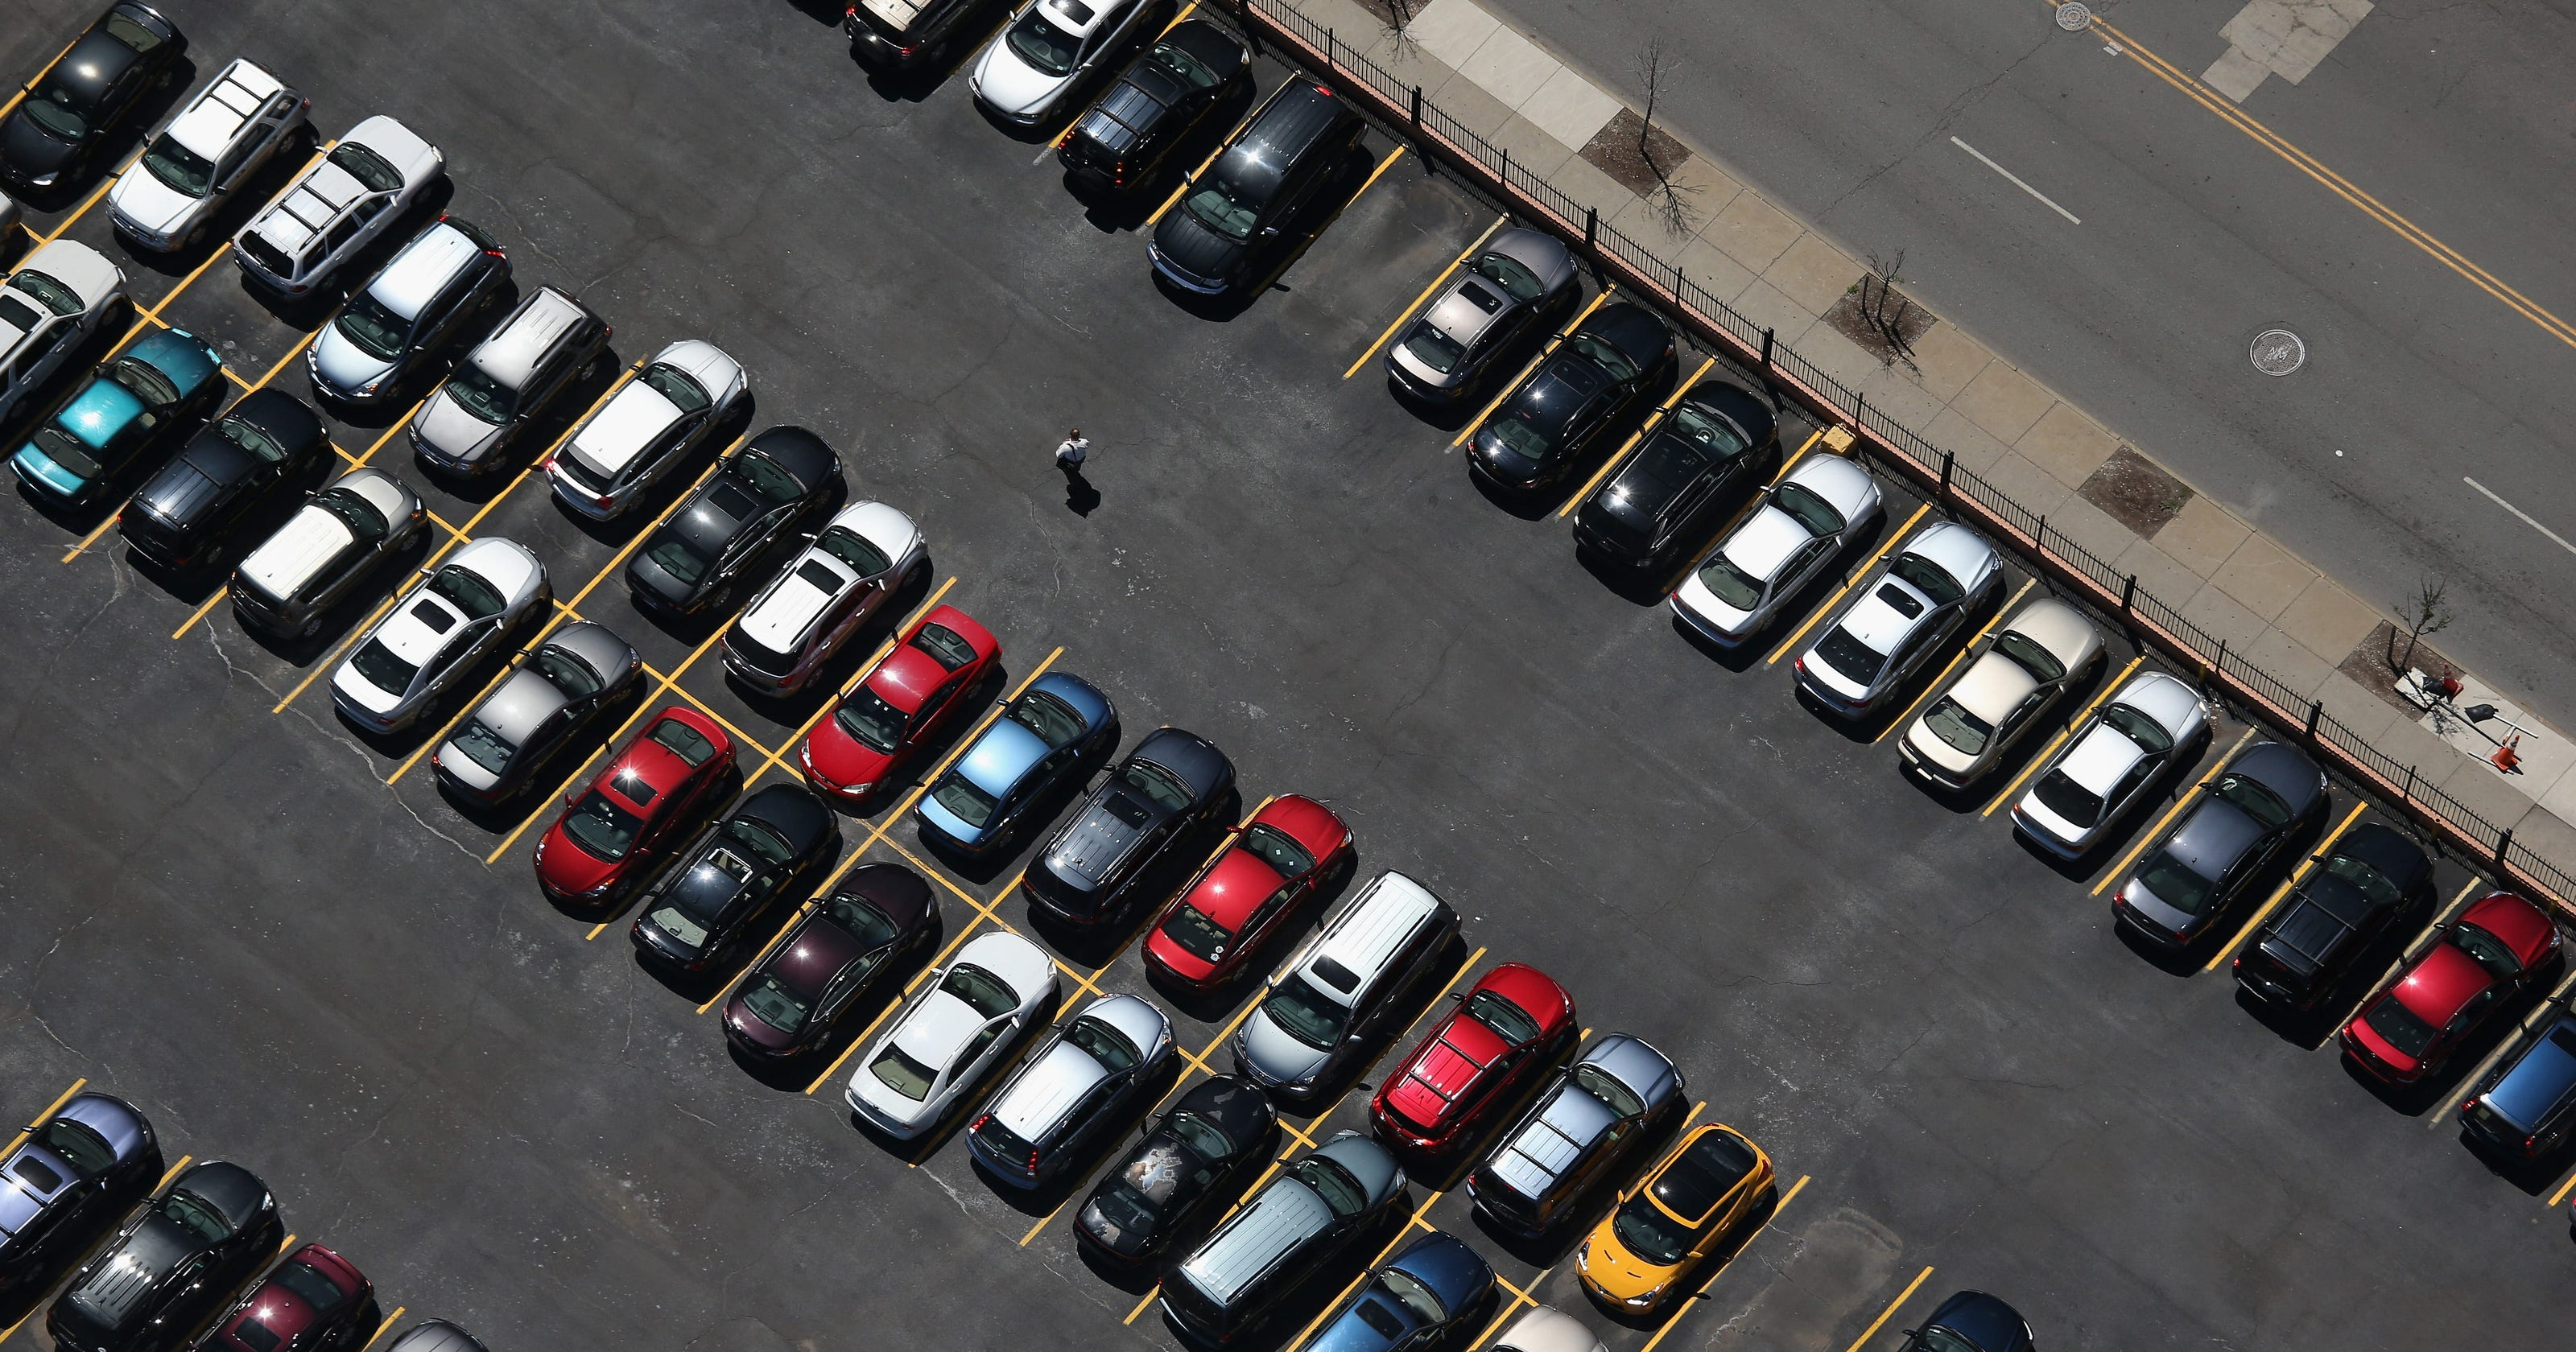 Car recalls for April 1-8 include 628,000 Acuras, 60,000 Chevrolets